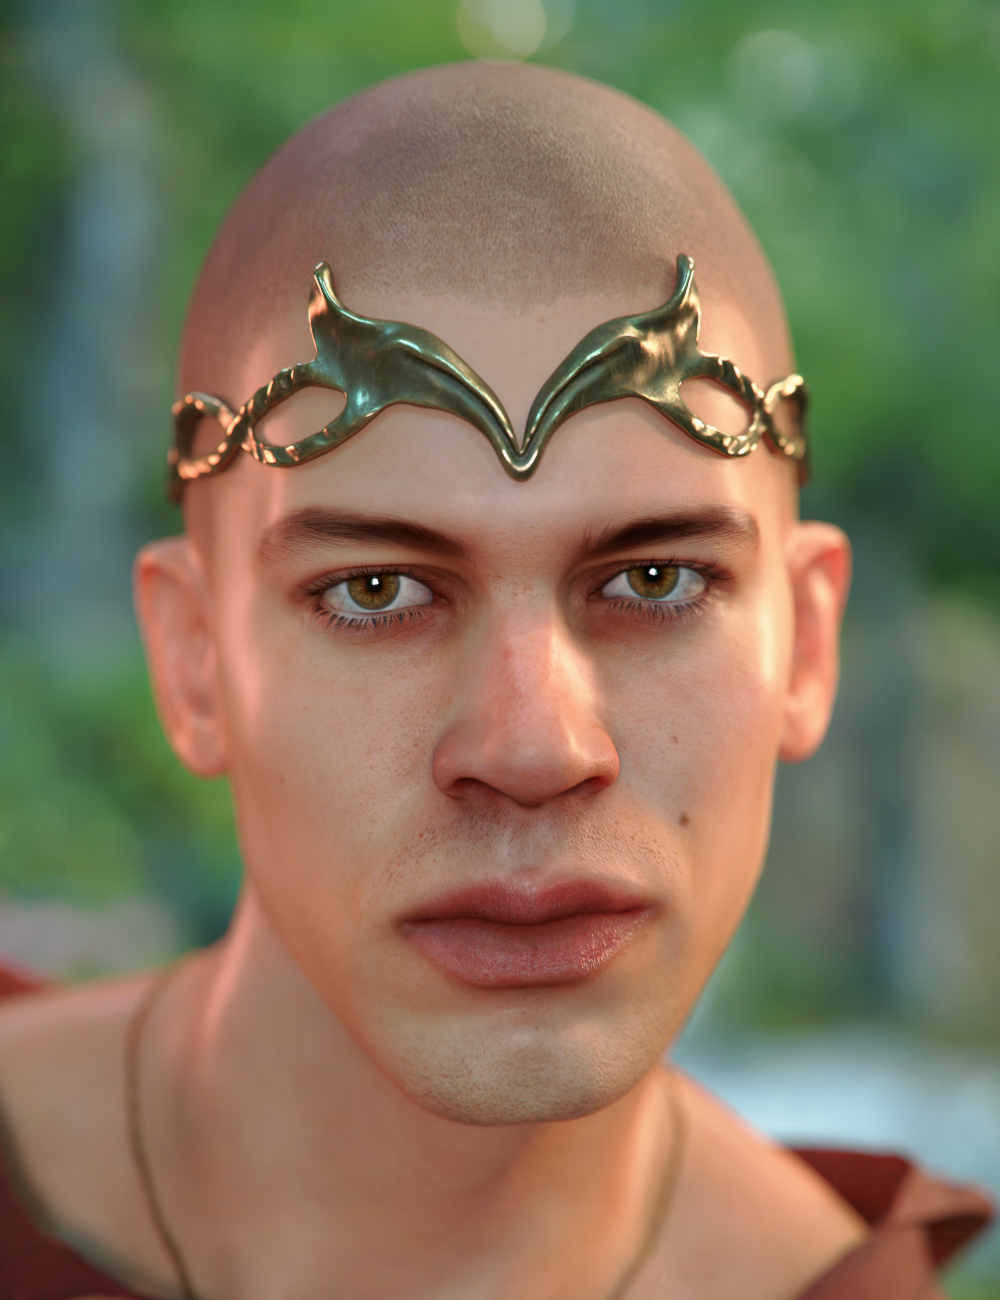 Dacre HD for Ashan 8 by: VincentXyooj, 3D Models by Daz 3D